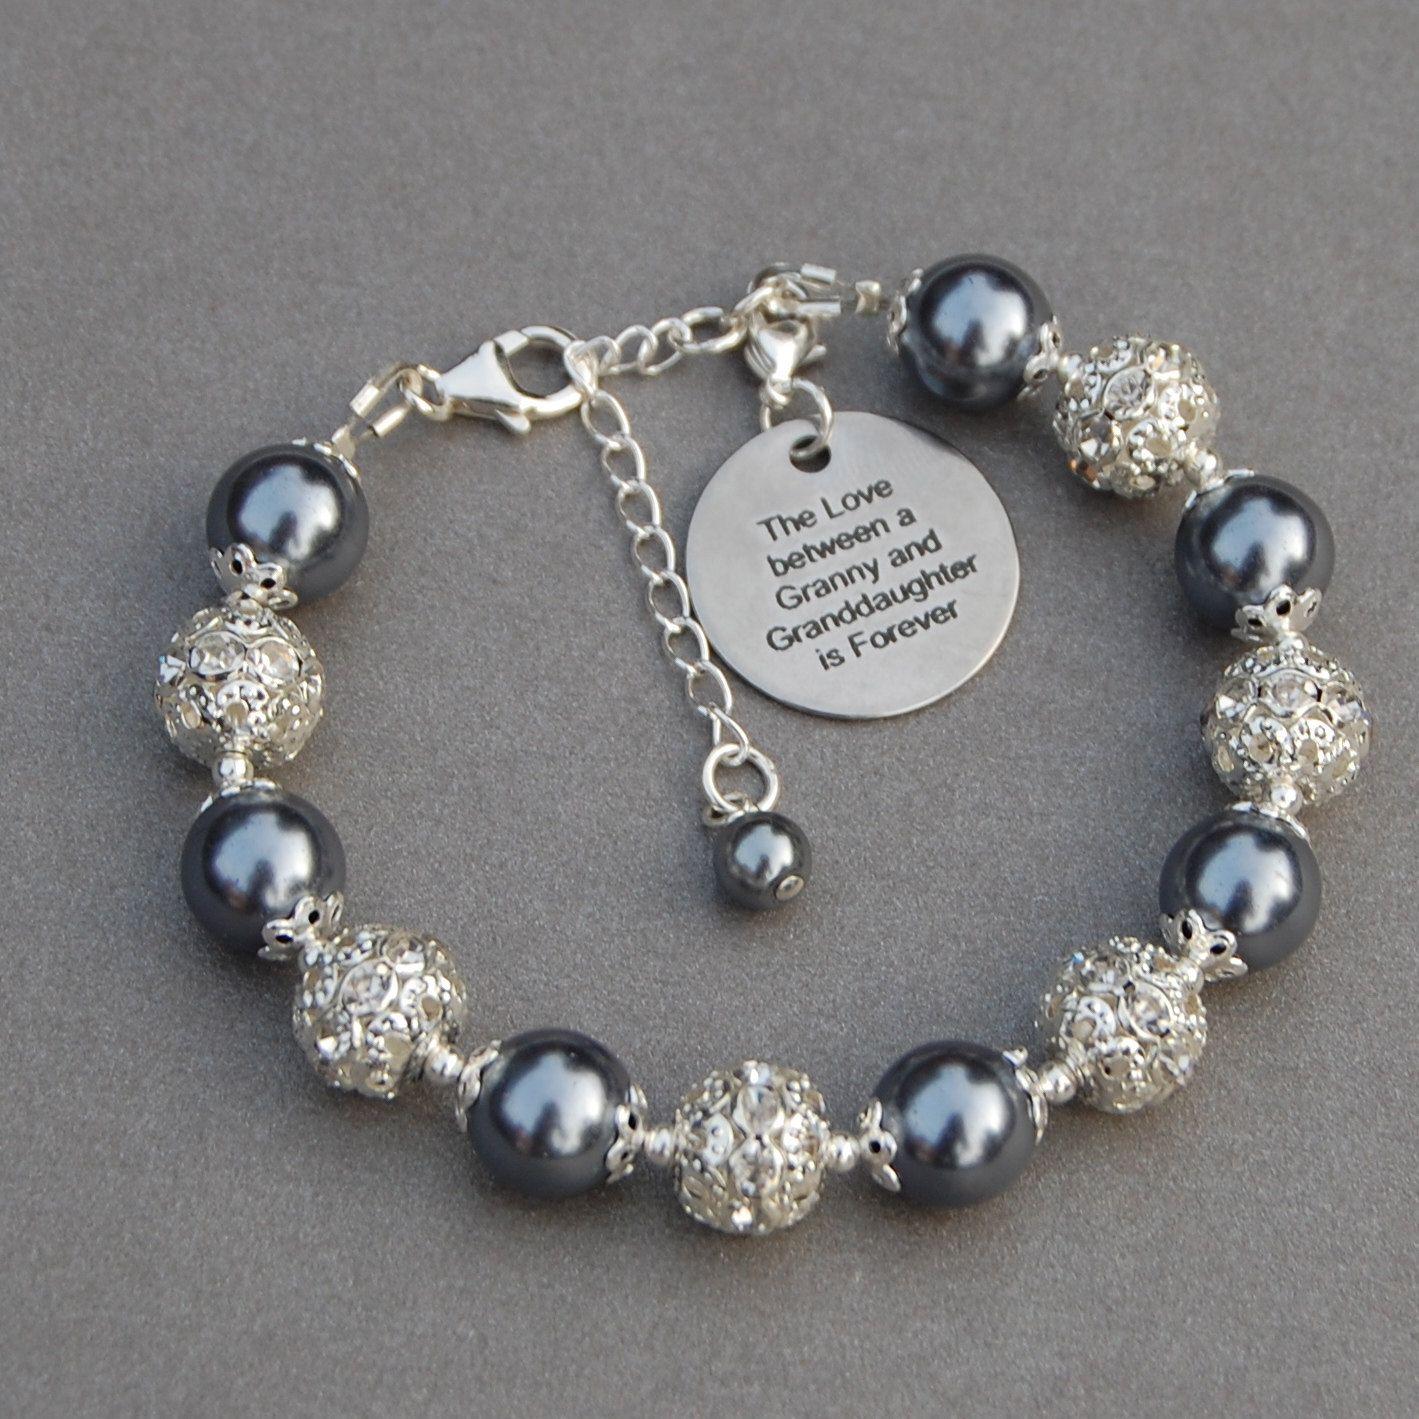 Granny Granddaughter Gift Granny Granddaughter Jewelry Granny Gift Granddaughter Bracelet Gift for Granny Grandmother Gift